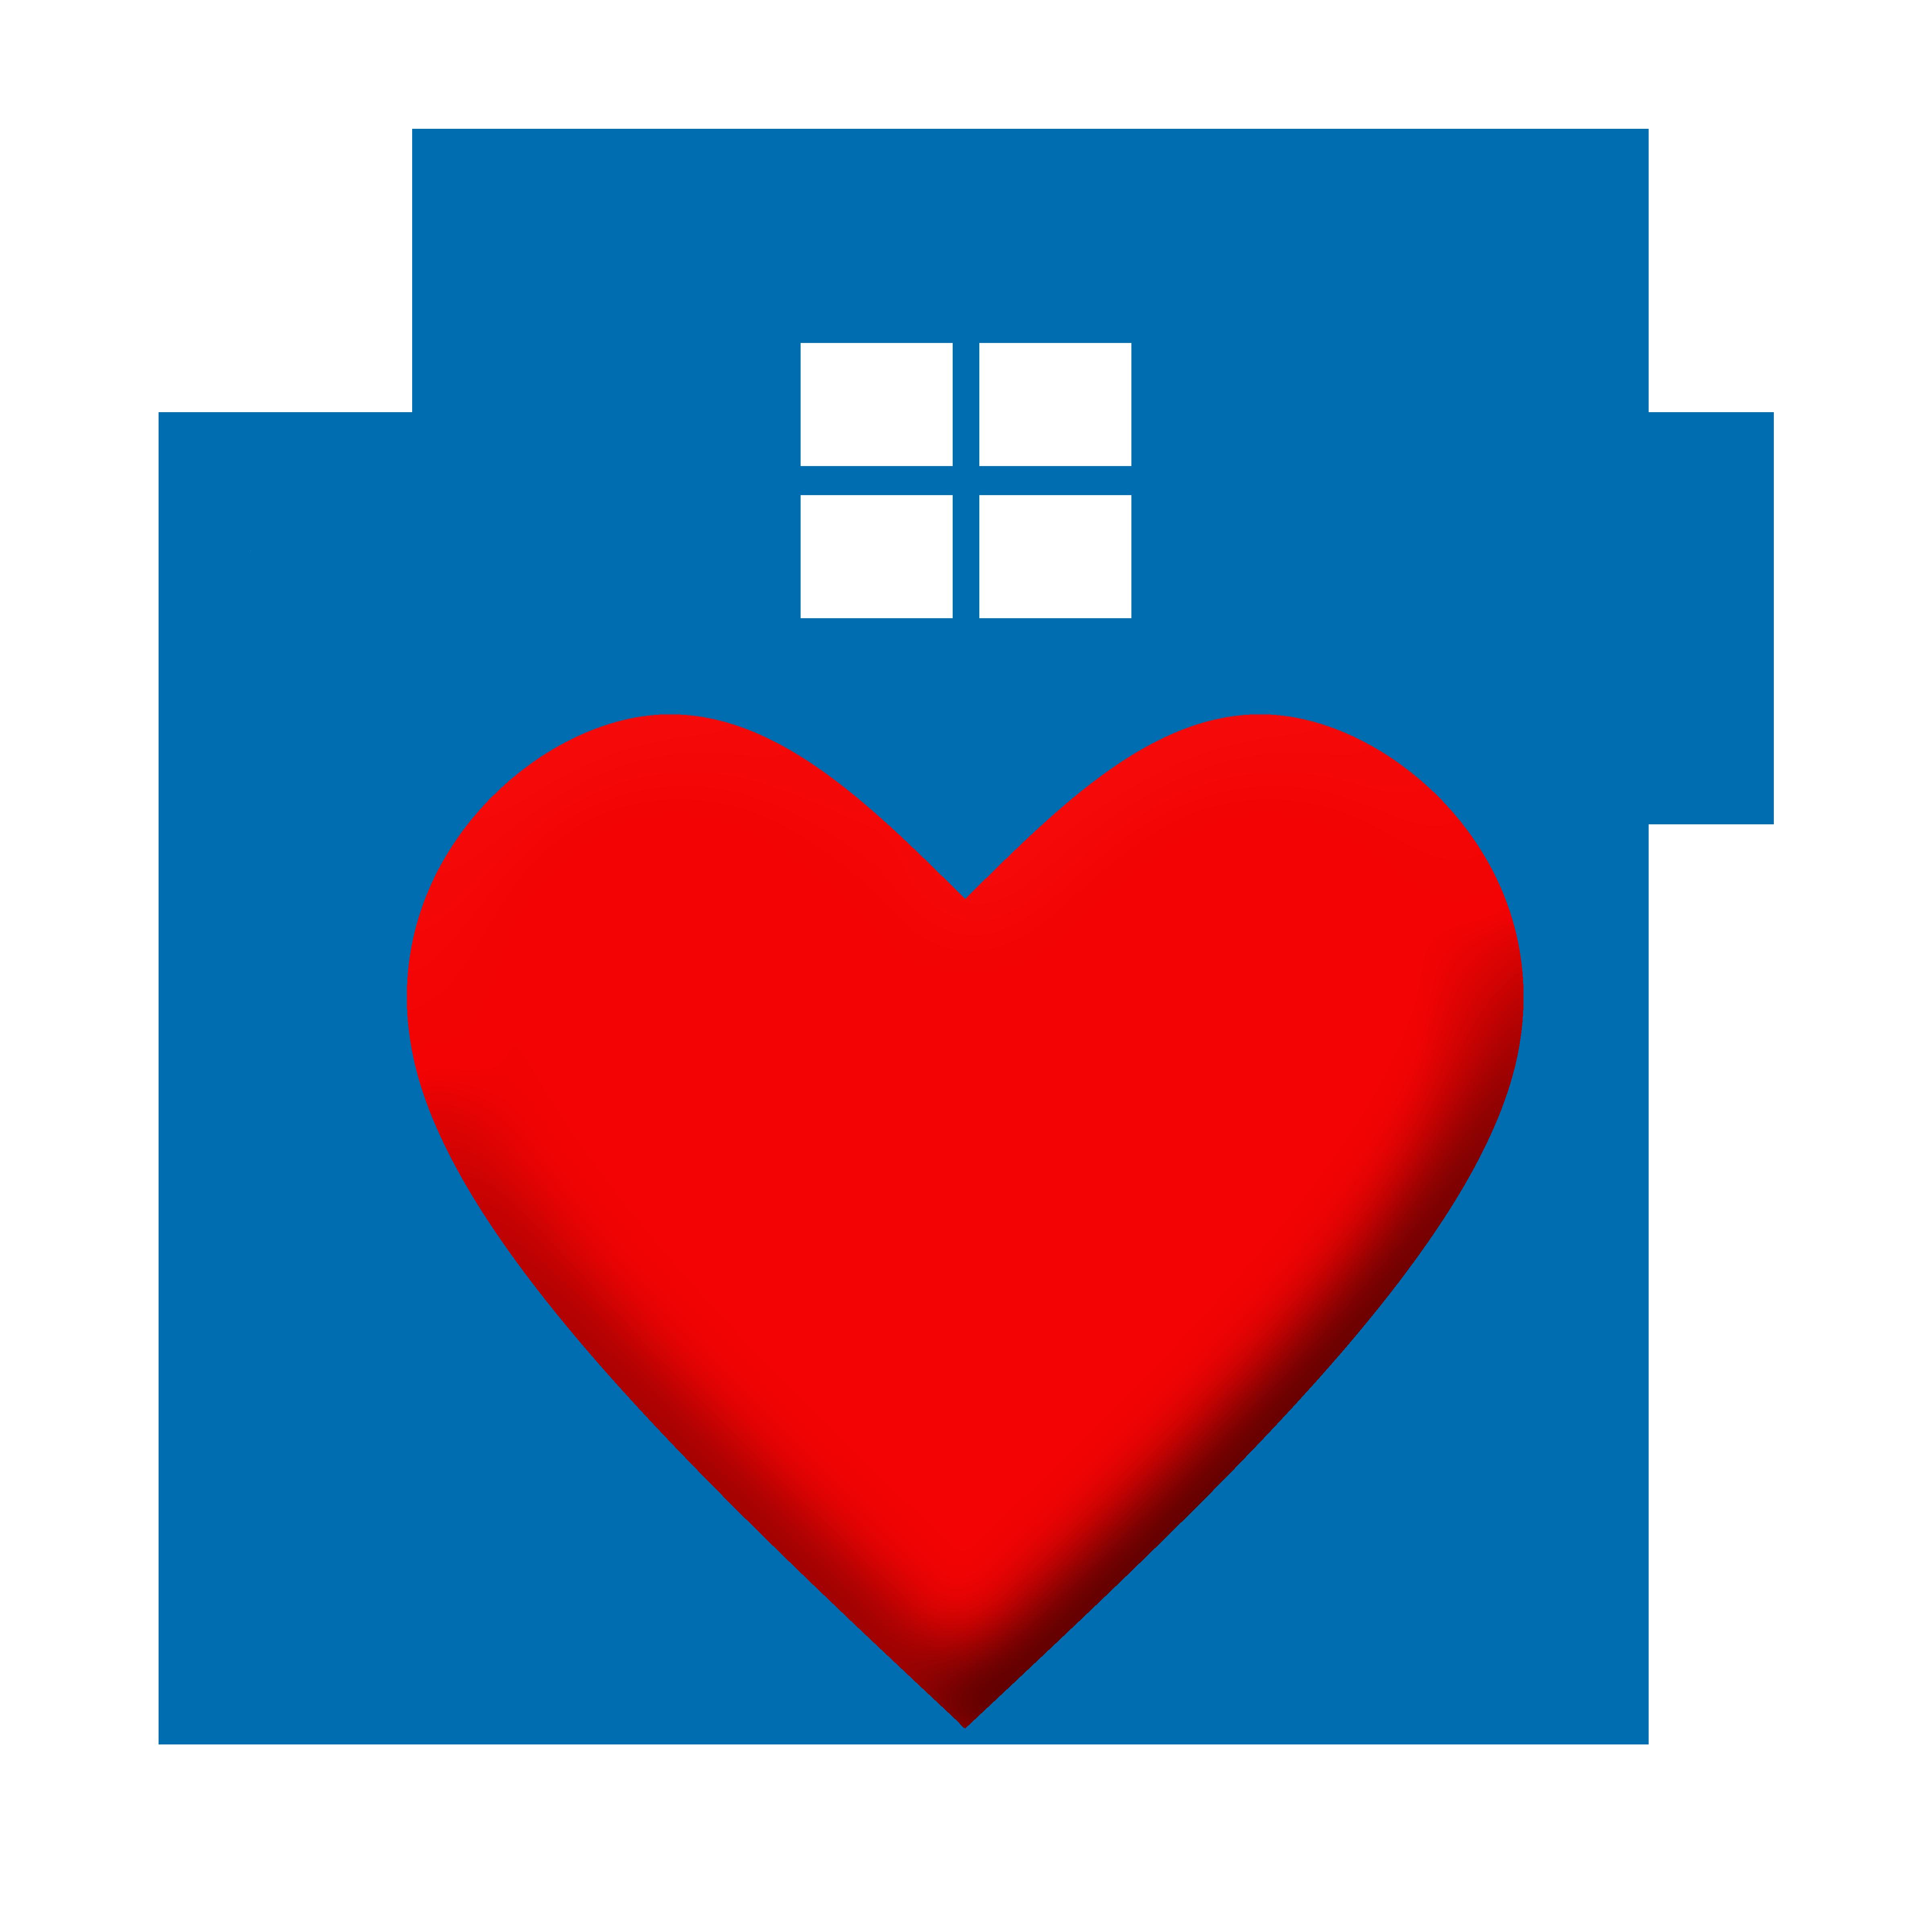 The Heartwarming House LLC